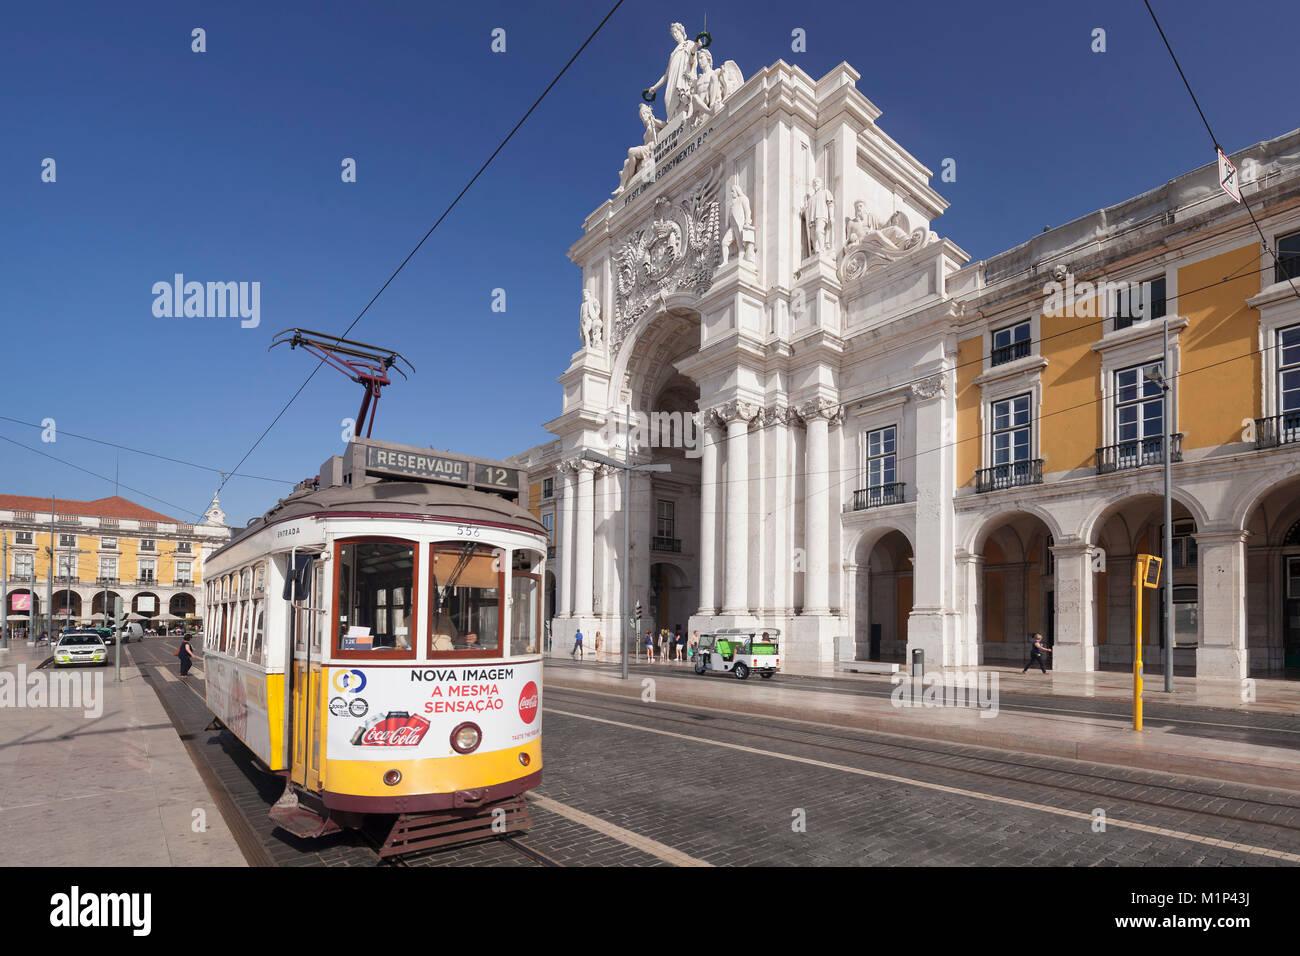 Tram, Arco da Rua Augusta de triomphe, Praca do Comercio, la Baixa, Lisbonne, Portugal, Europe Photo Stock